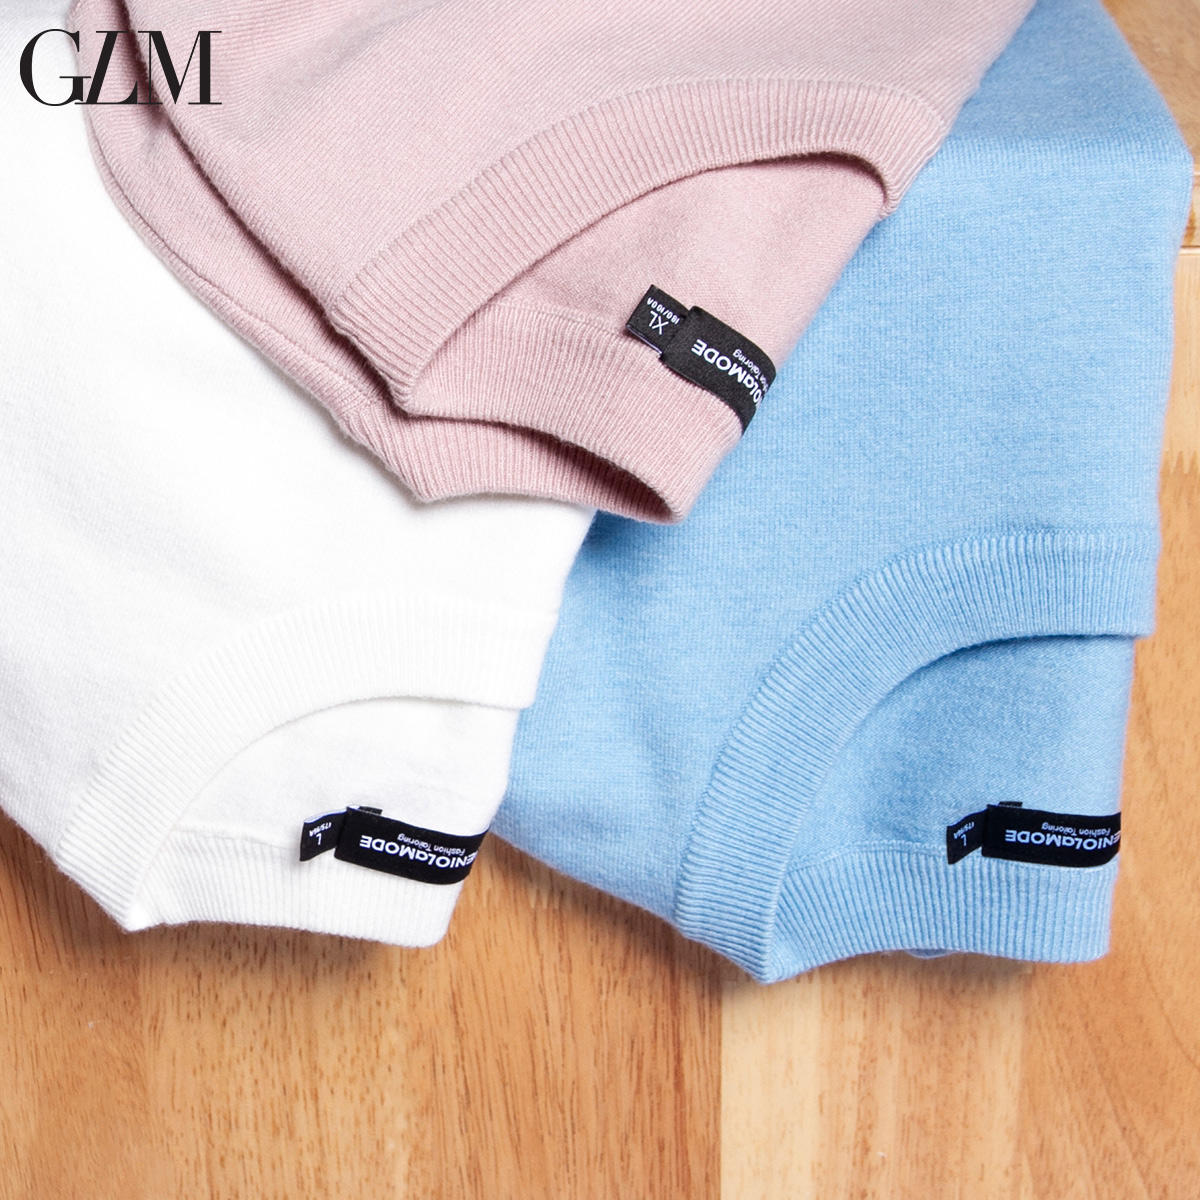 GLM男装2018冬季新款青年弹力罗纹套头衫纯色简约毛衫打底衫